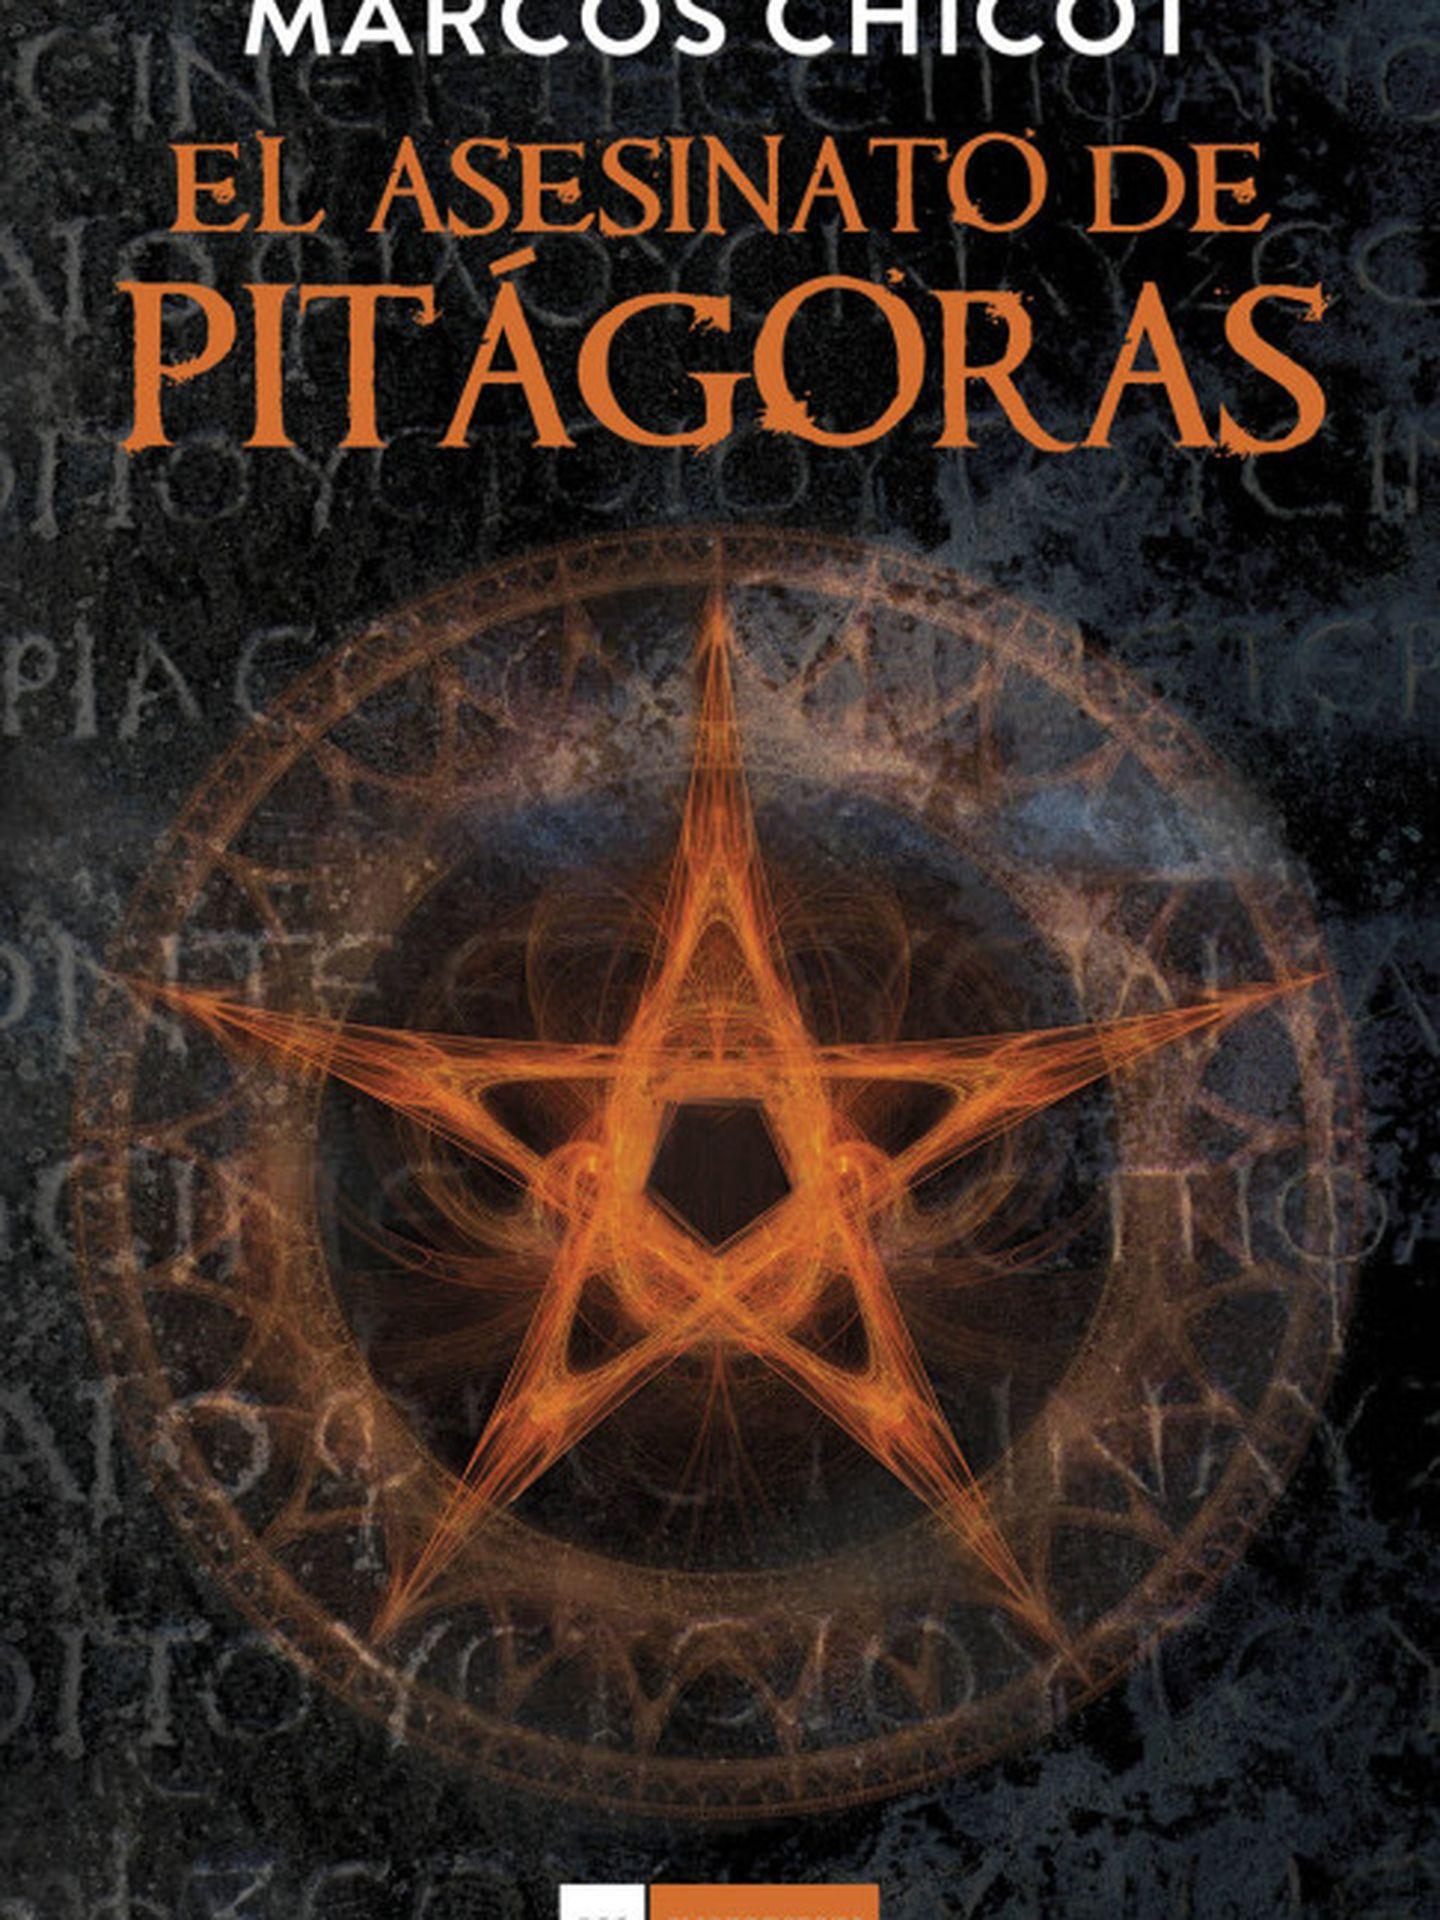 Portada de 'El asesinato de Pitágoras'